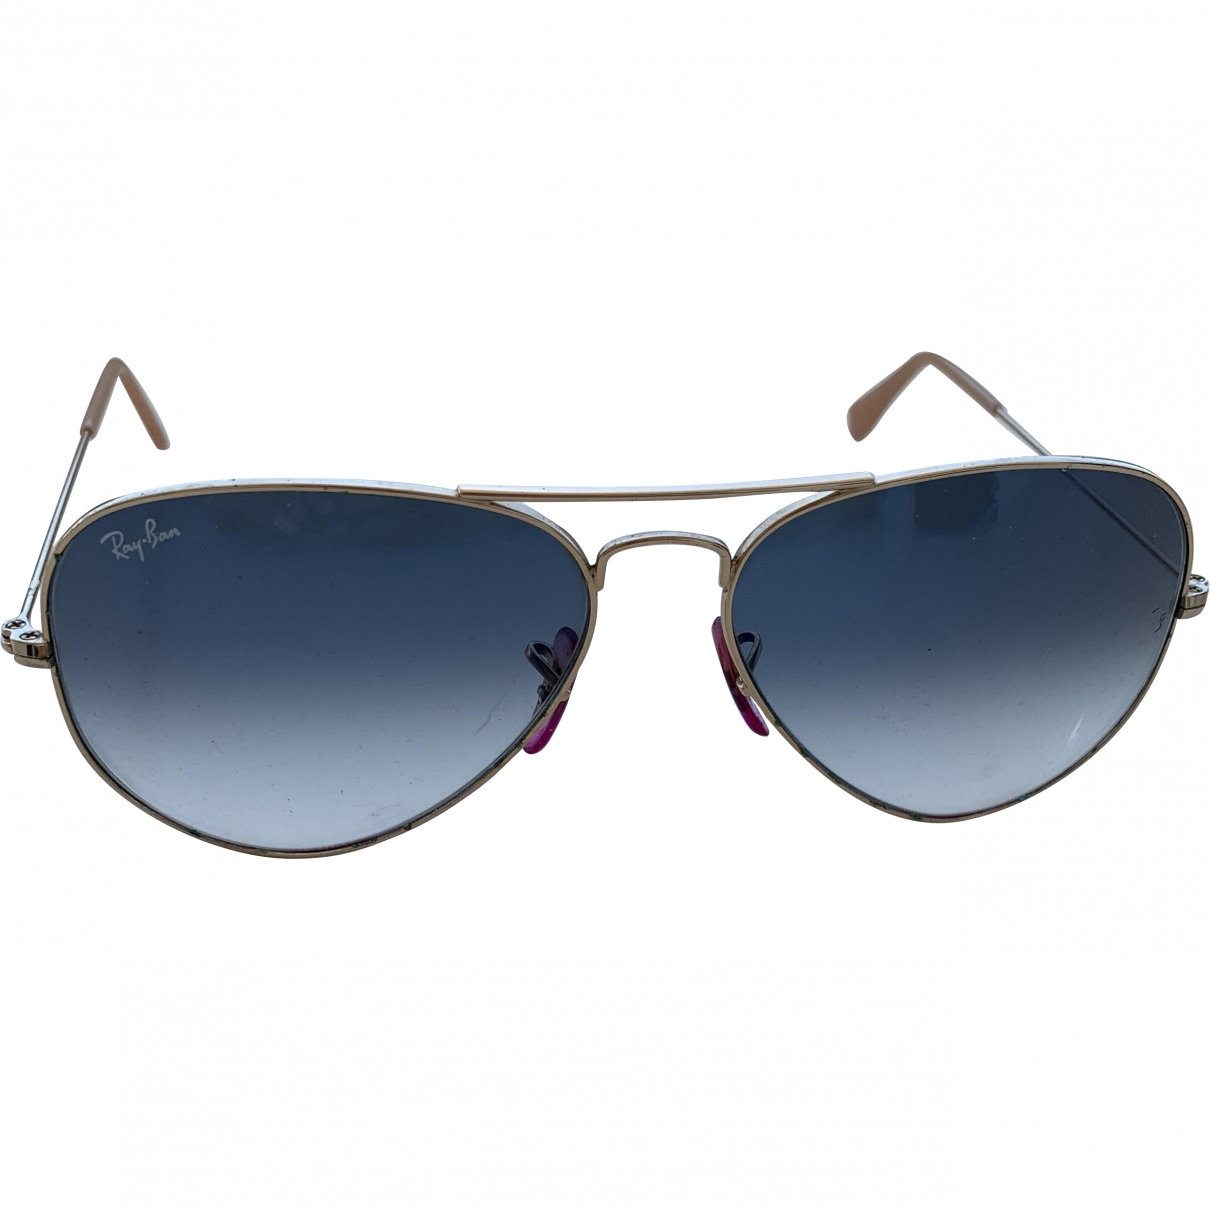 Ray-ban \N Sonnenbrillen in  Blau Metall